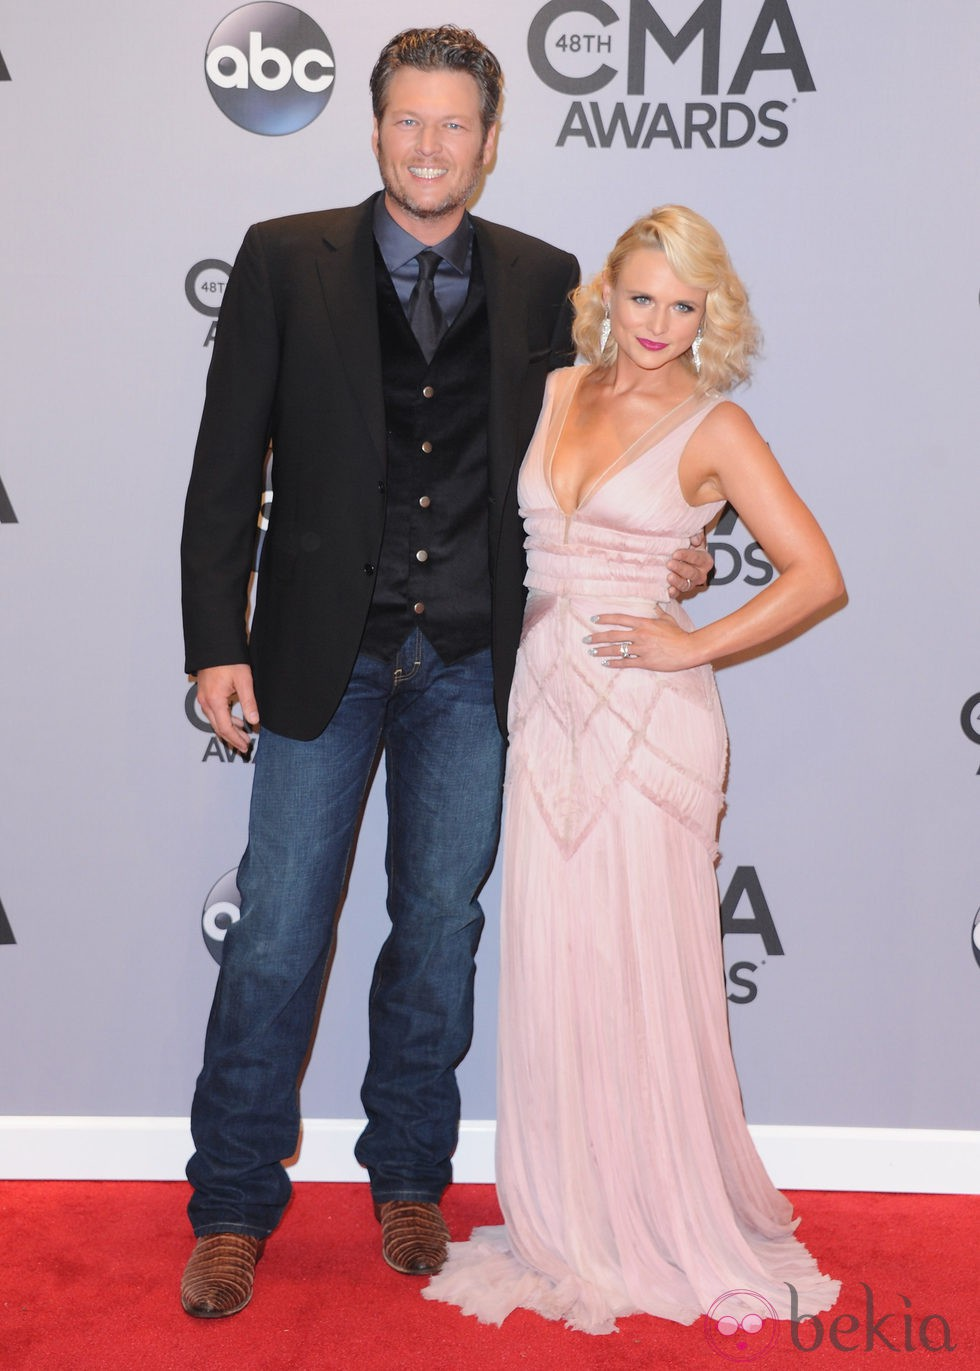 Miranda Lambert y Blake Shelton en la entrega de los premios CMA Awards 2014